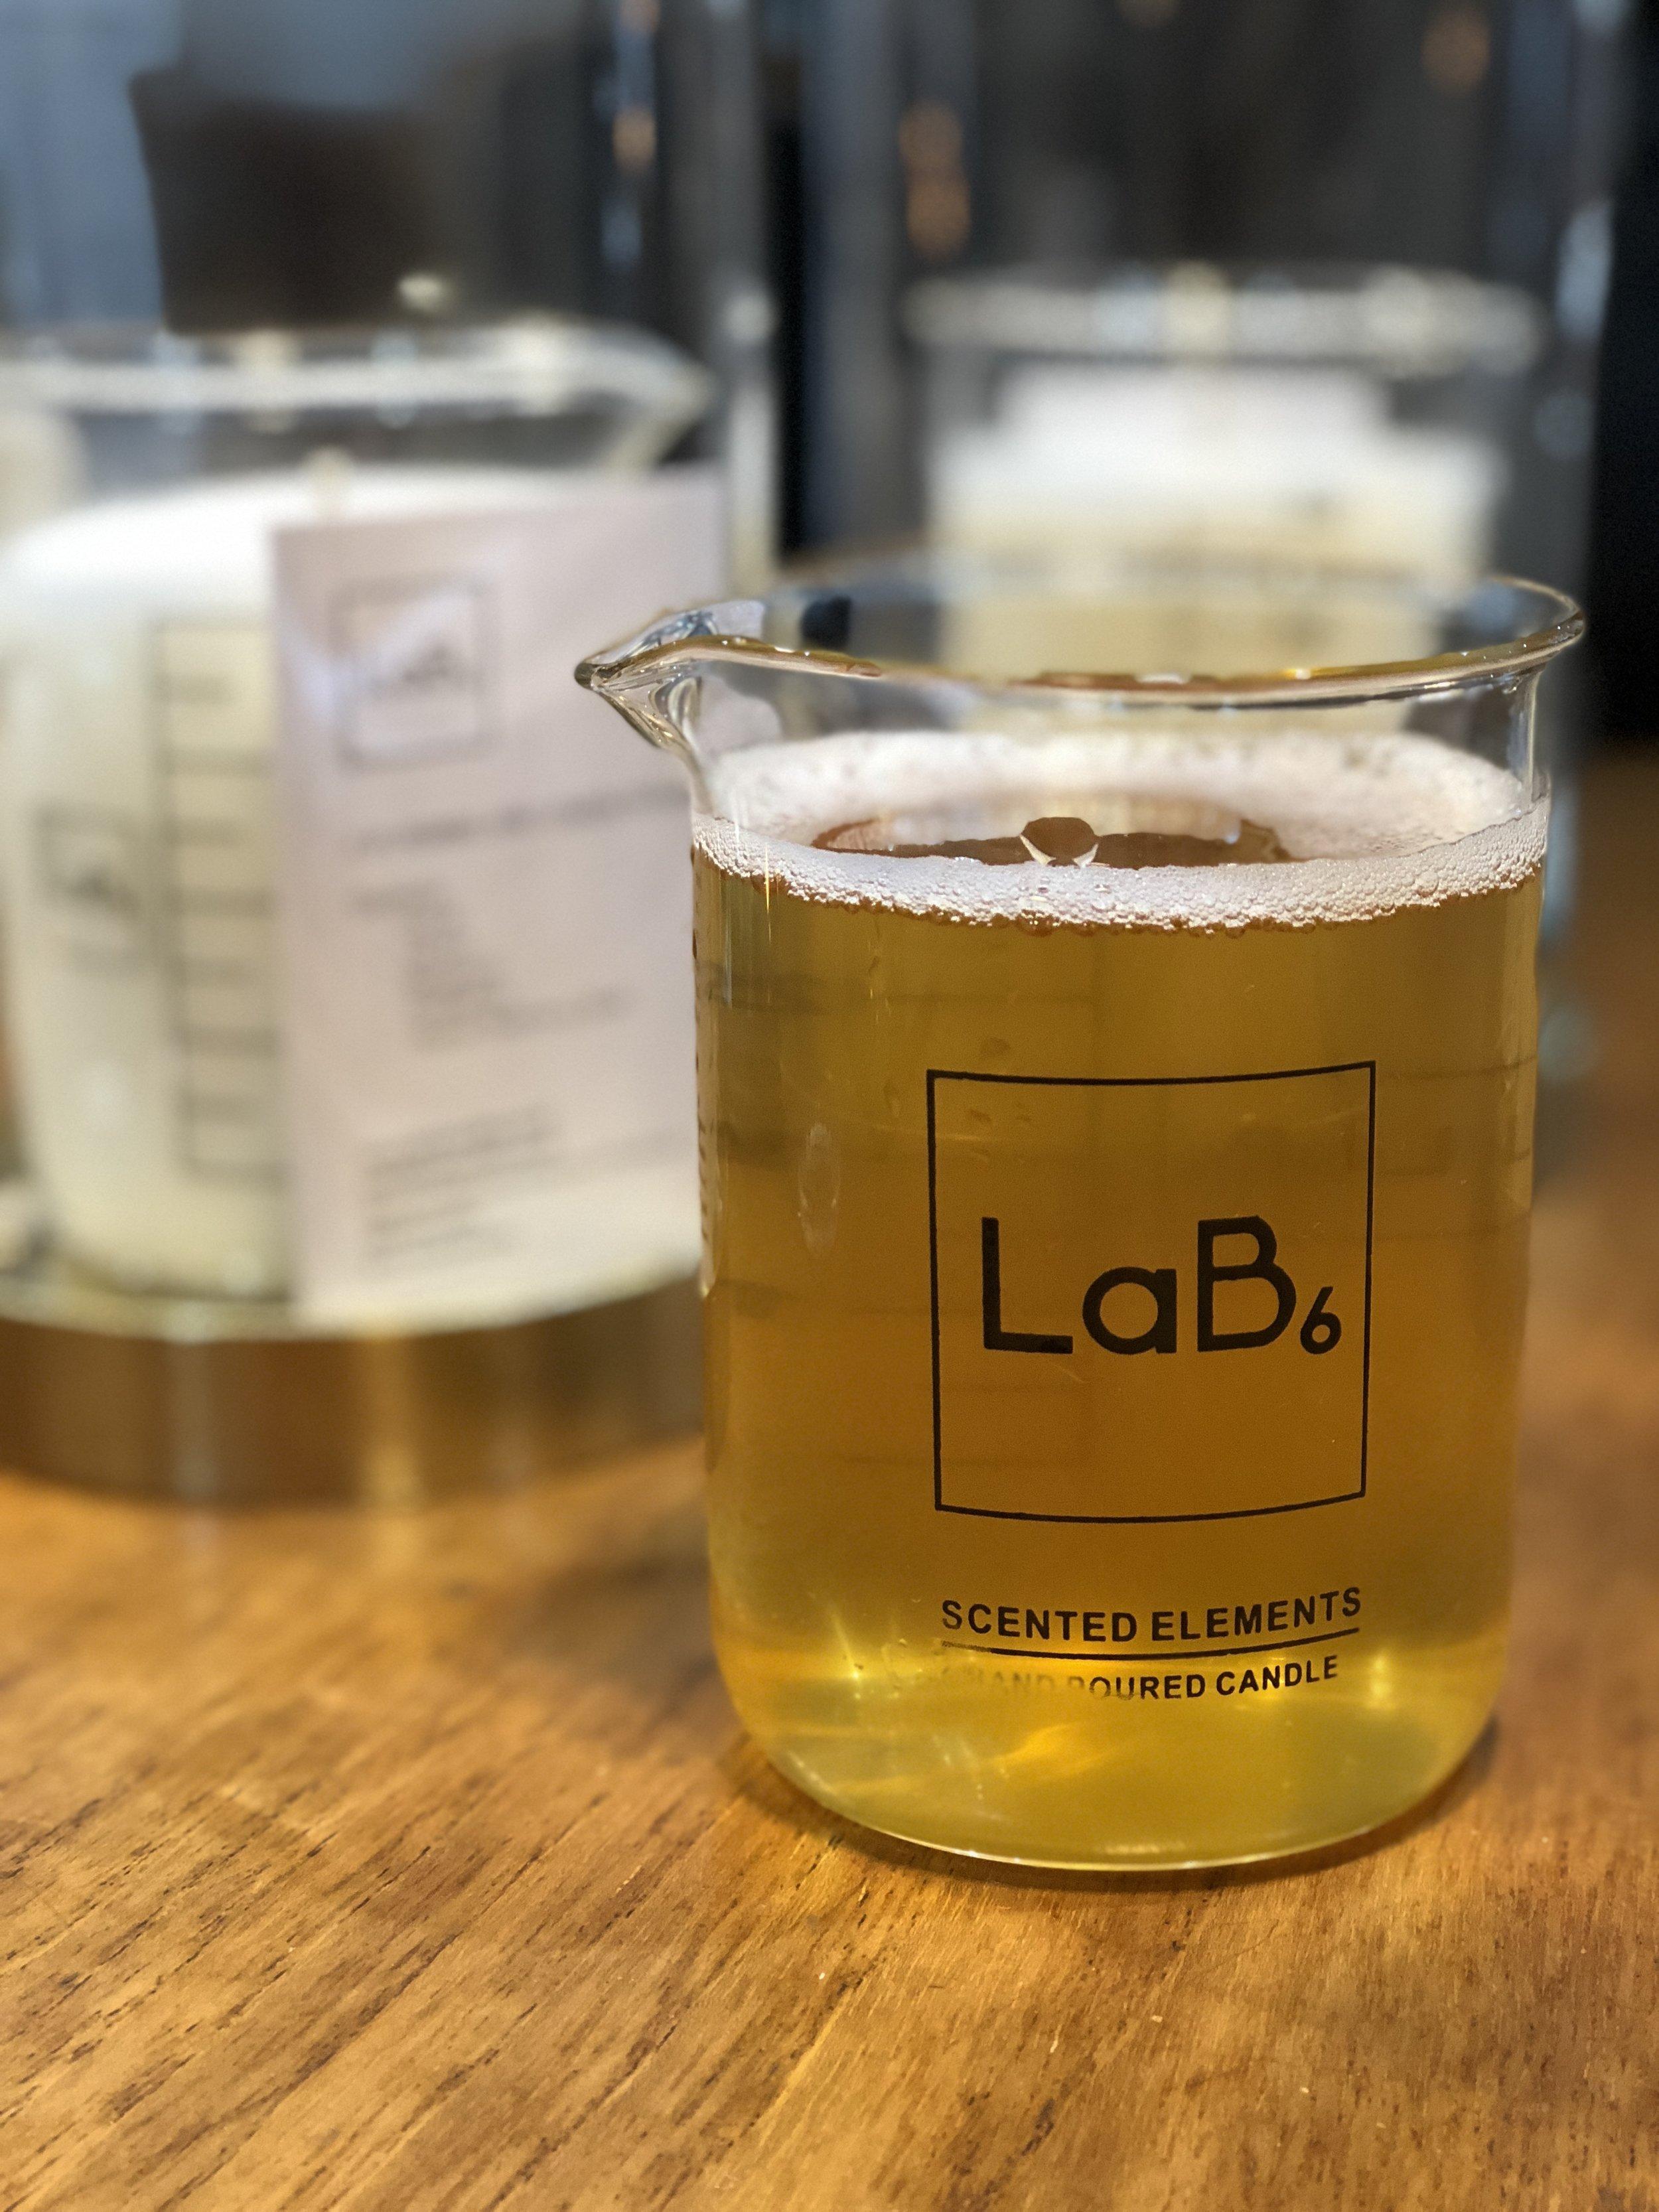 Cider LaB6.JPG